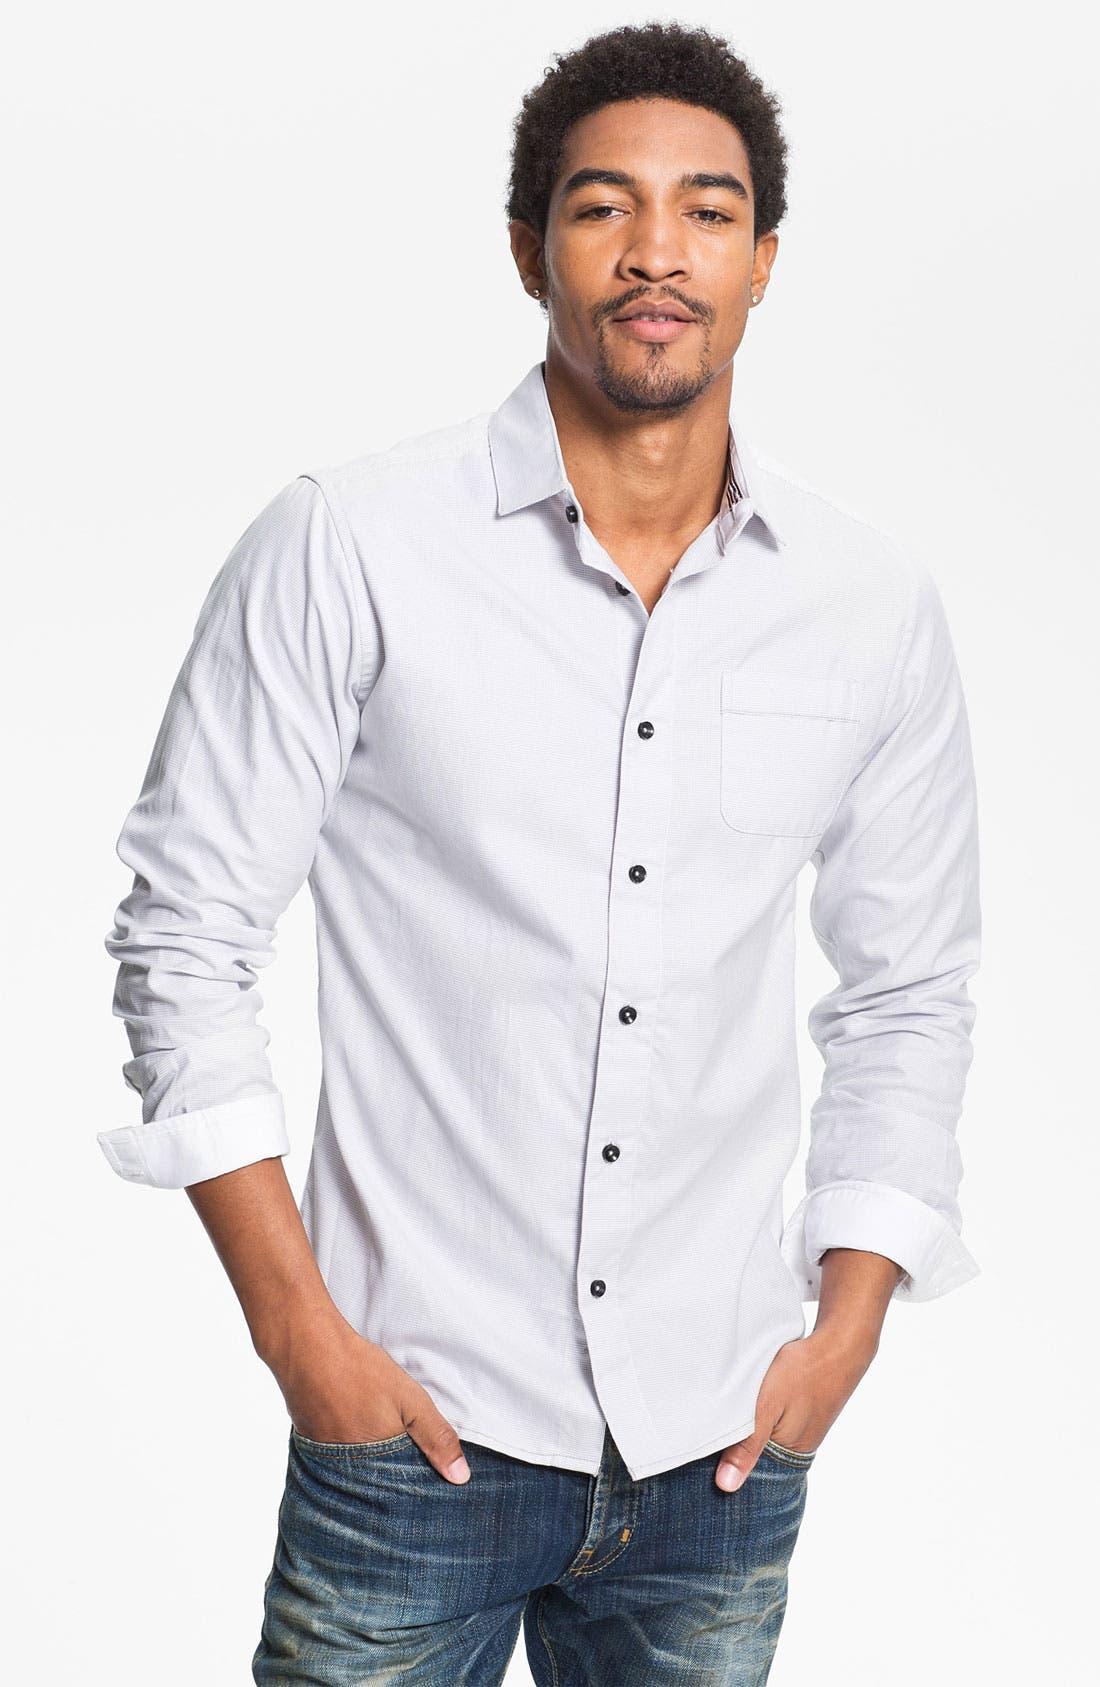 Alternate Image 1 Selected - Descendant of Thieves 'Corona' Woven Shirt